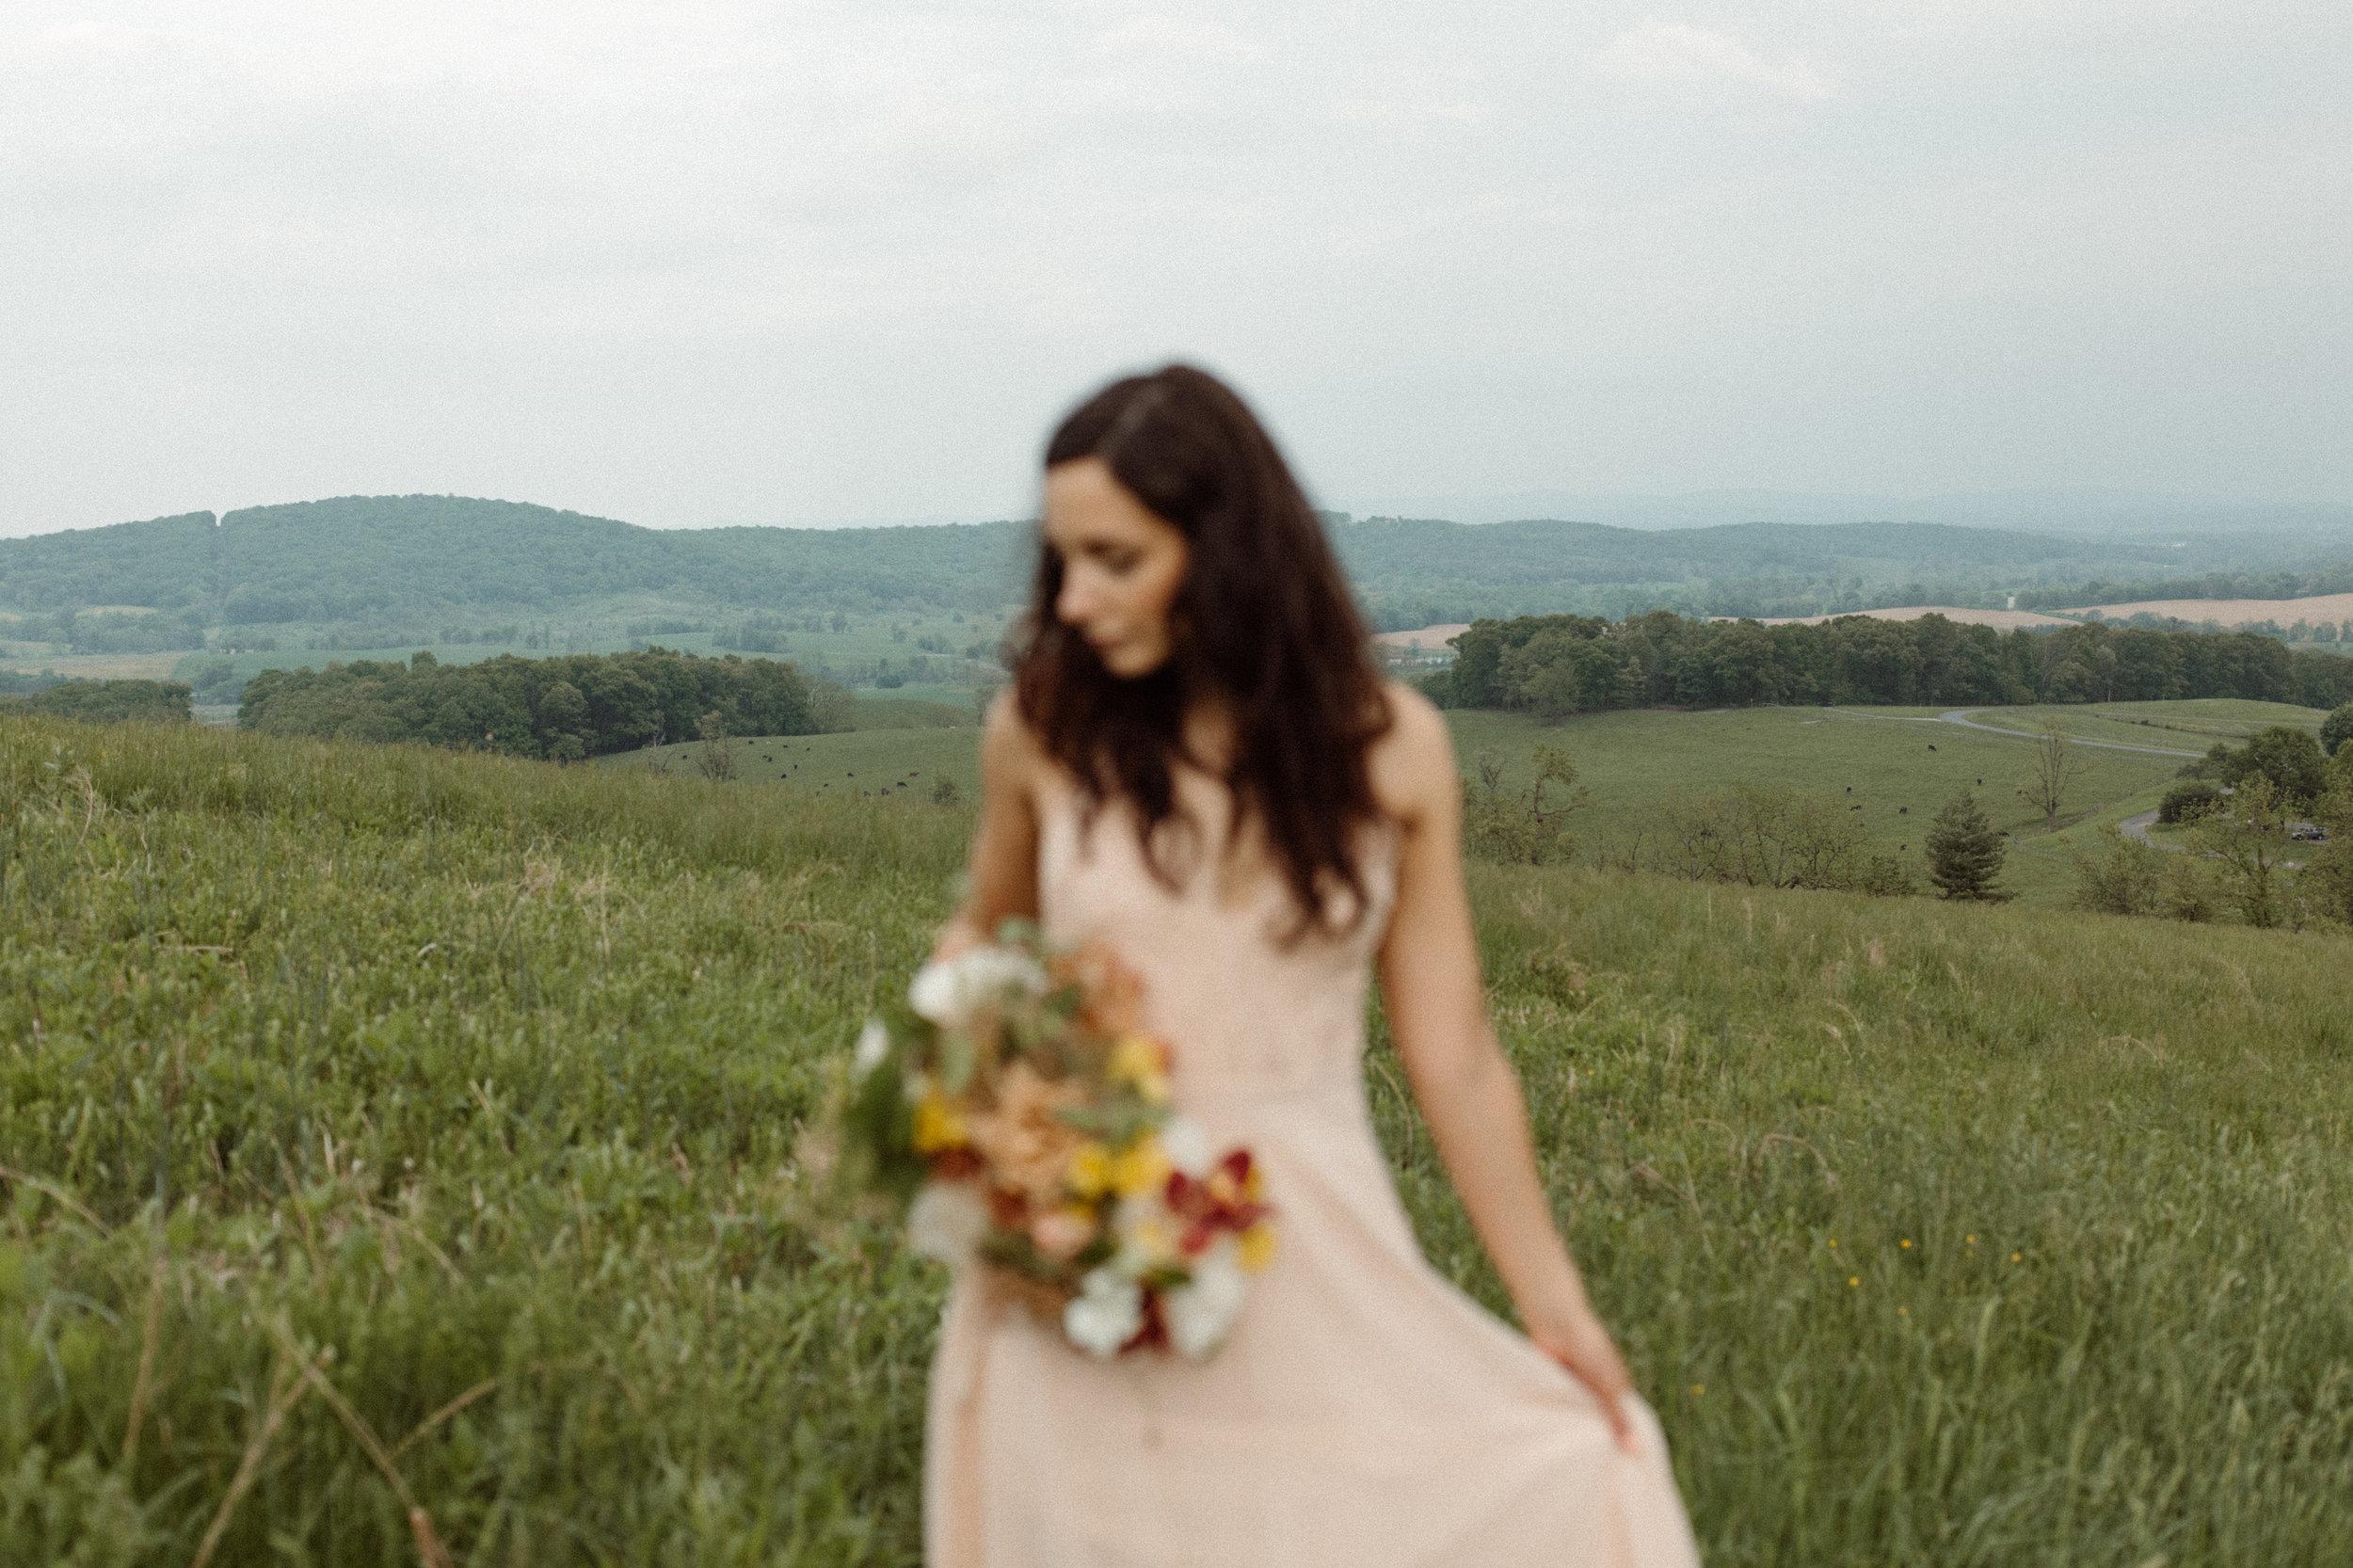 kelsey&mark-engagement-skymeadows-2019-peytoncurry-9490.jpg